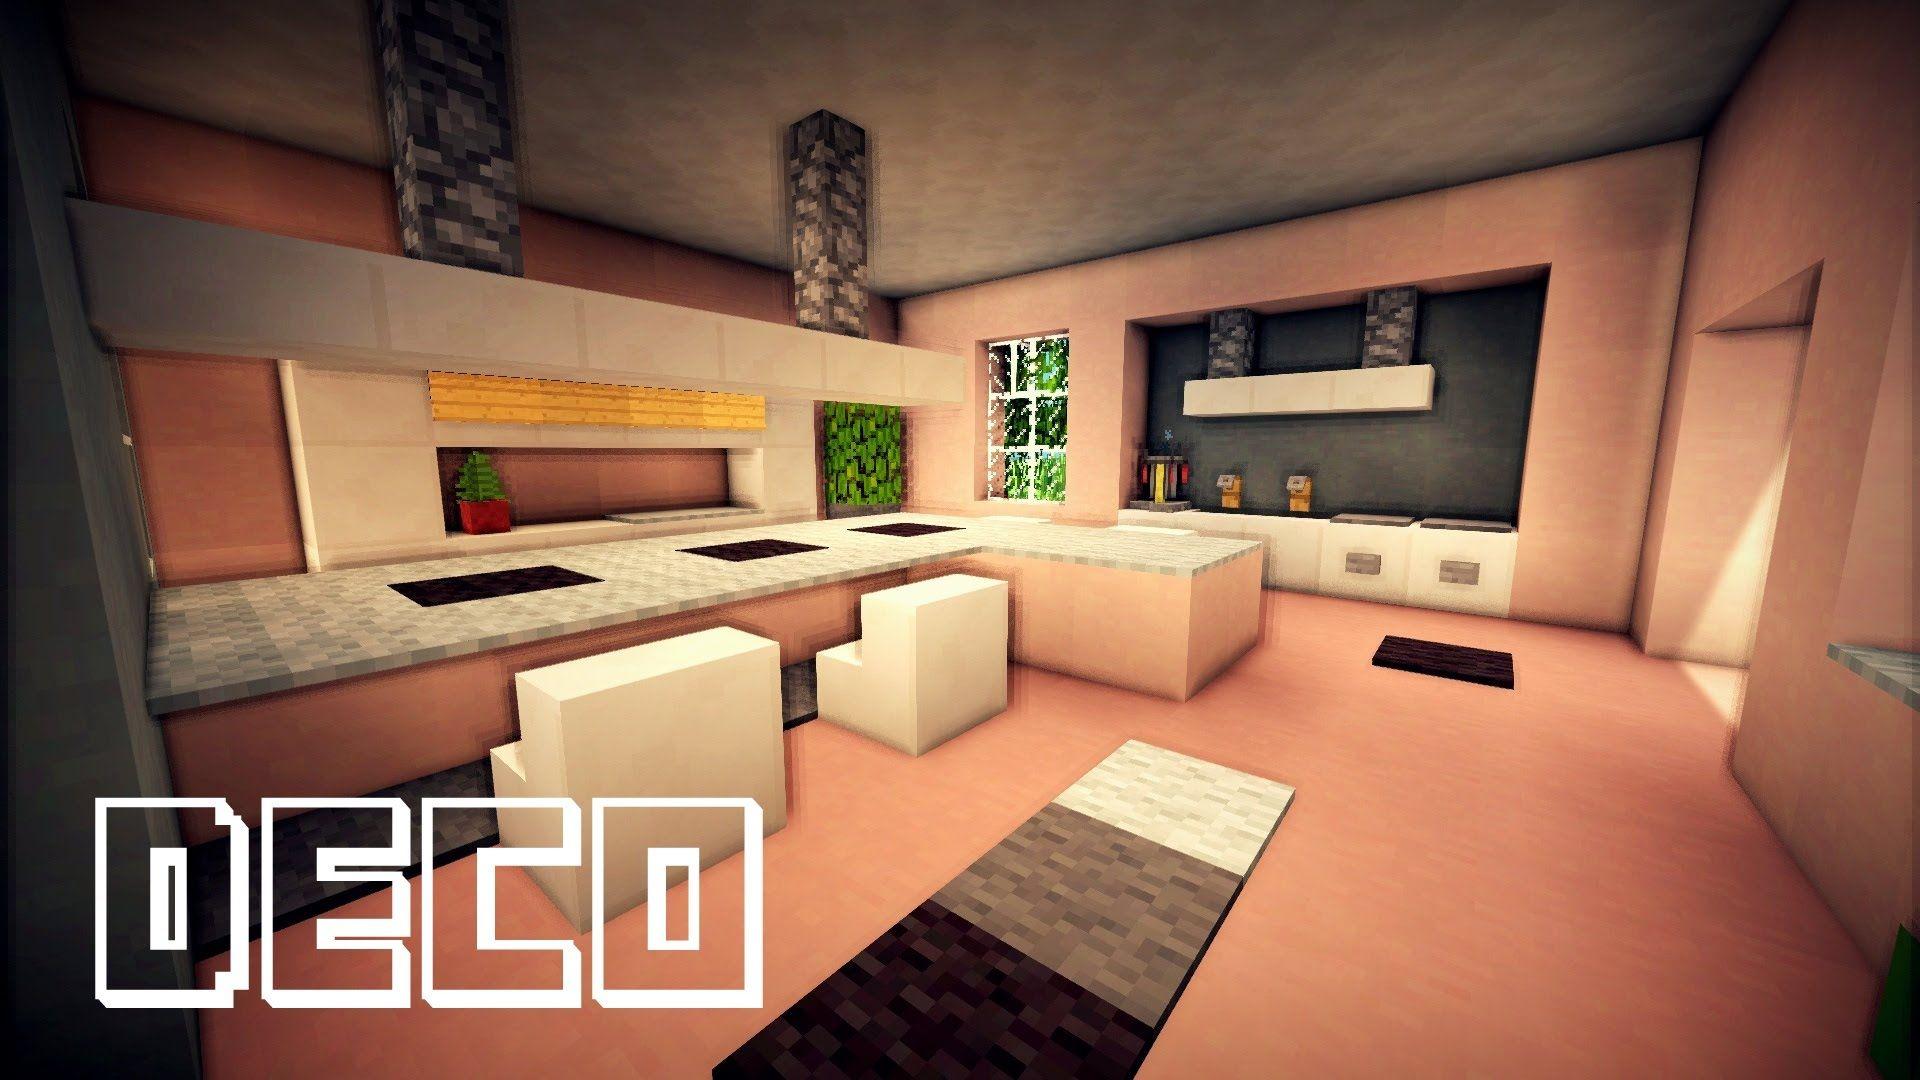 Deco Interieur Maison Moderne Minecraft Burnsocial